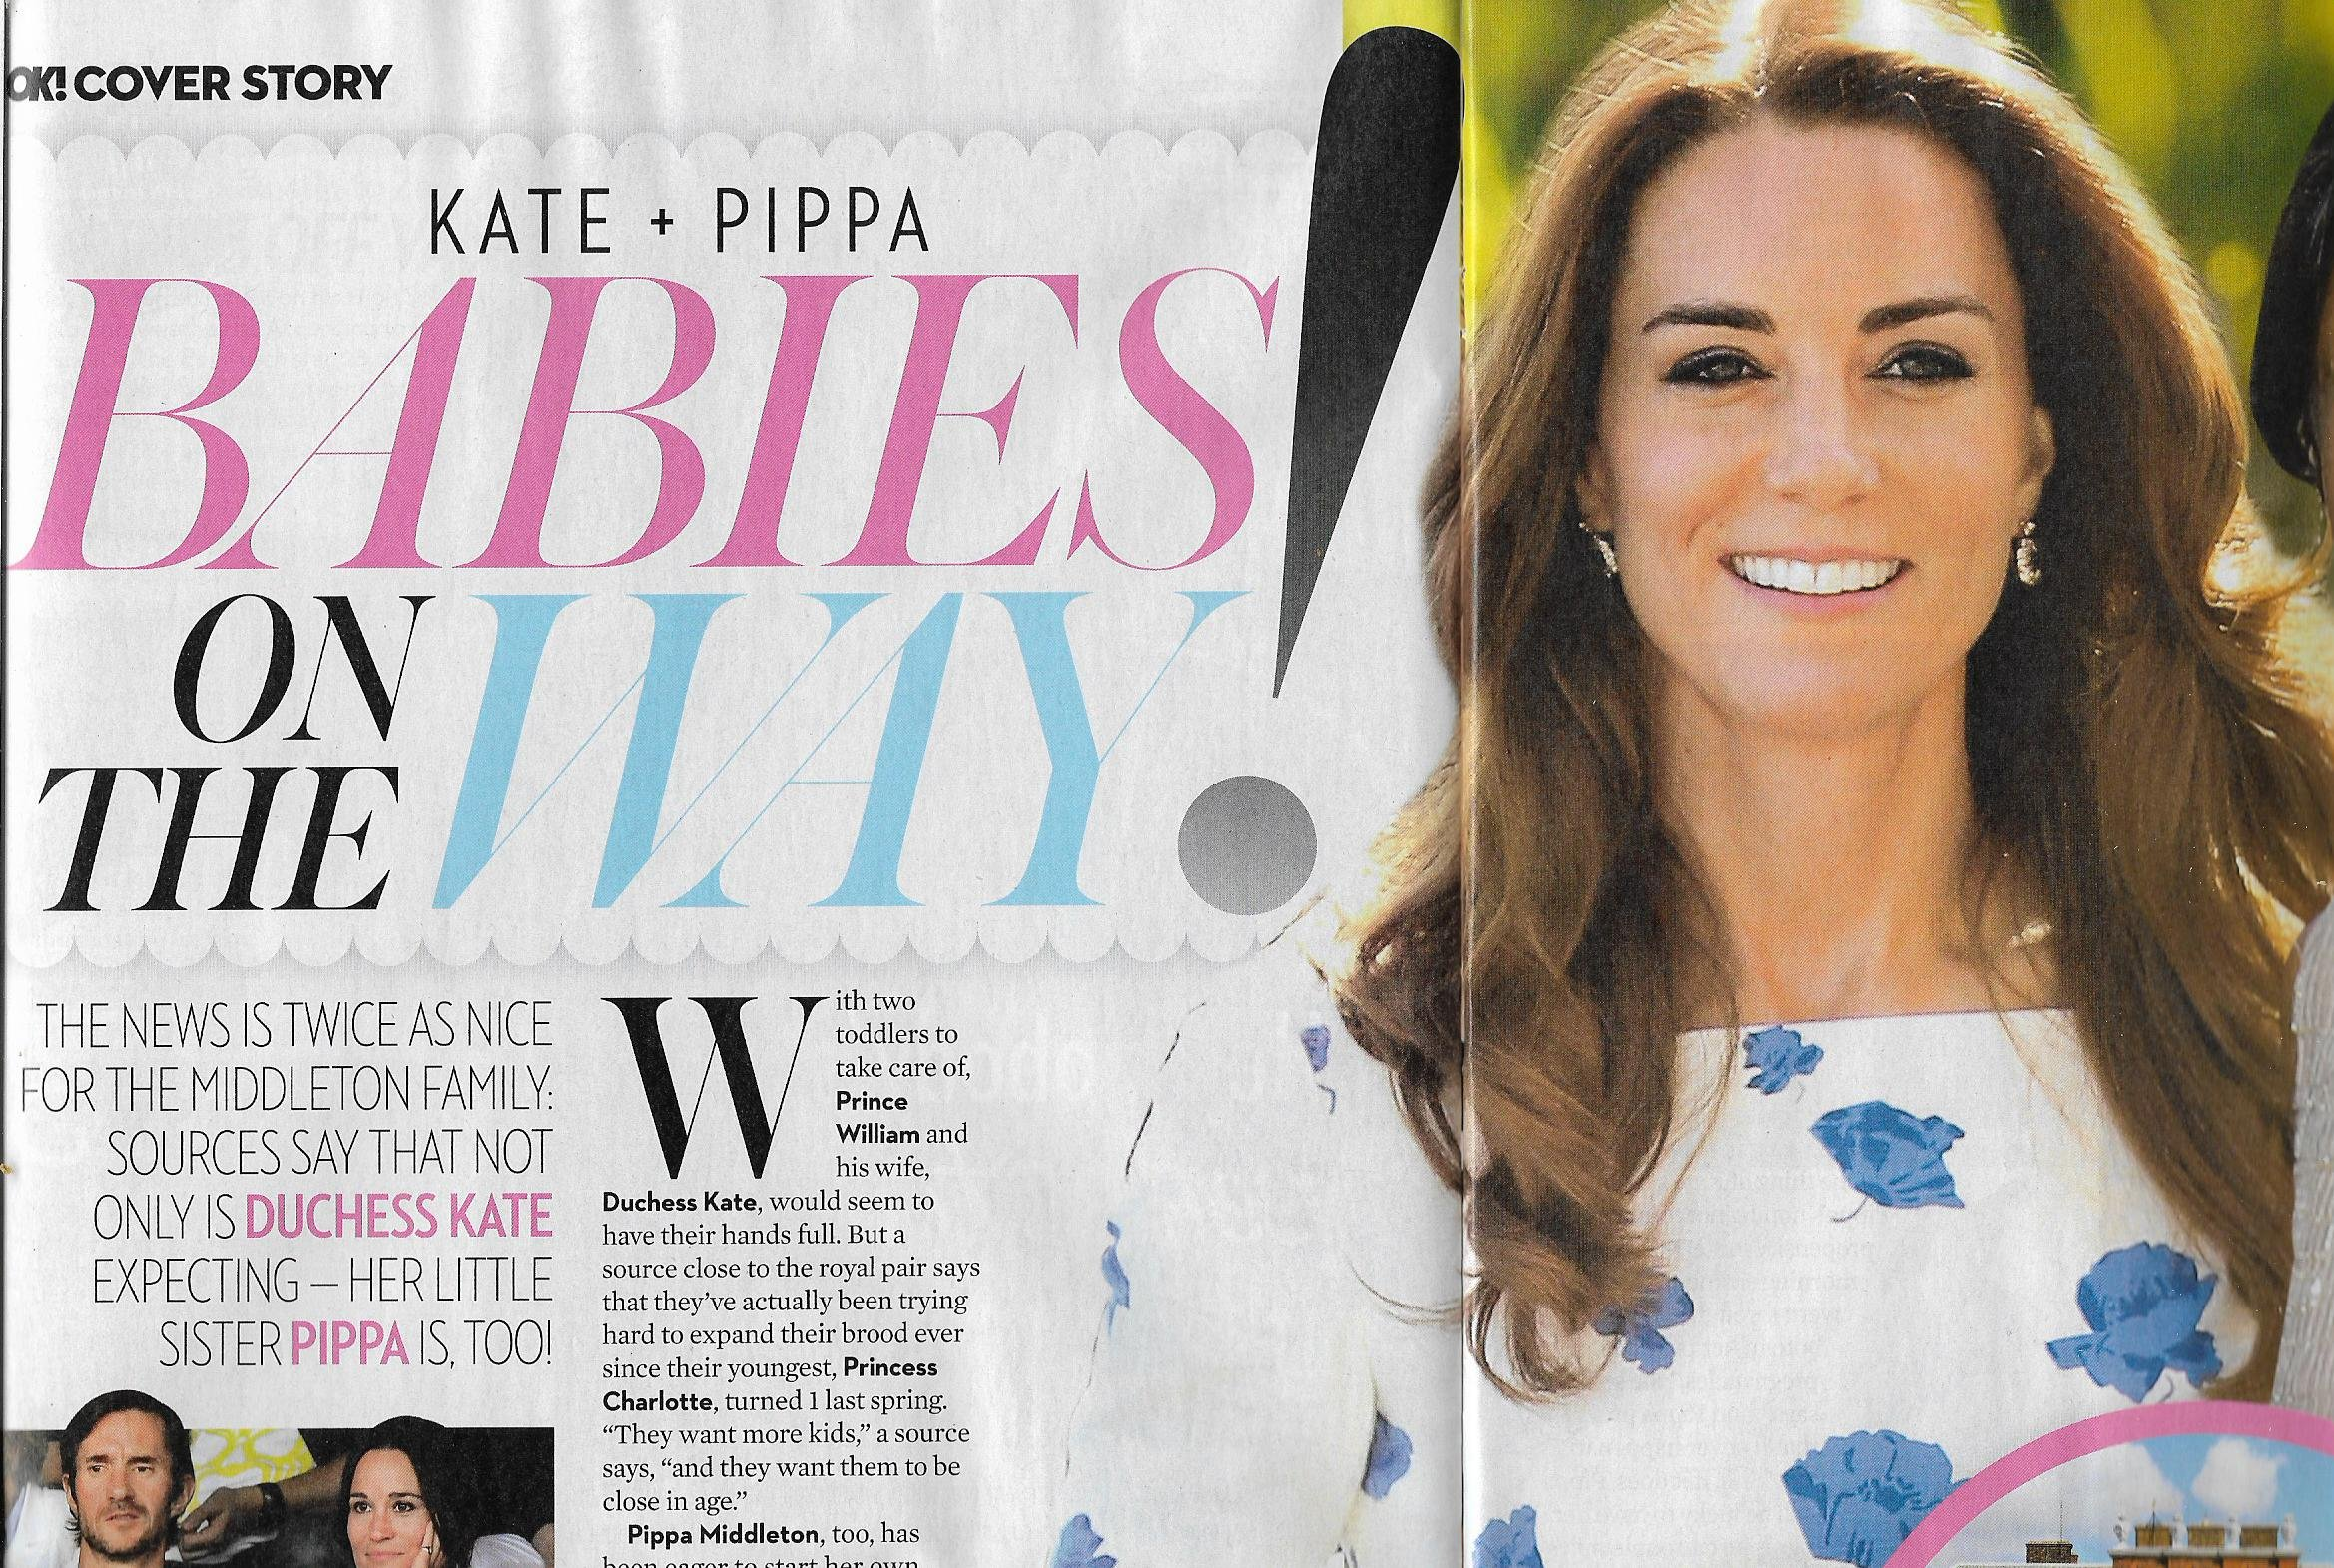 Princess Kate & Pippa Middleton l Summer's Sexiest Beach Bodies l